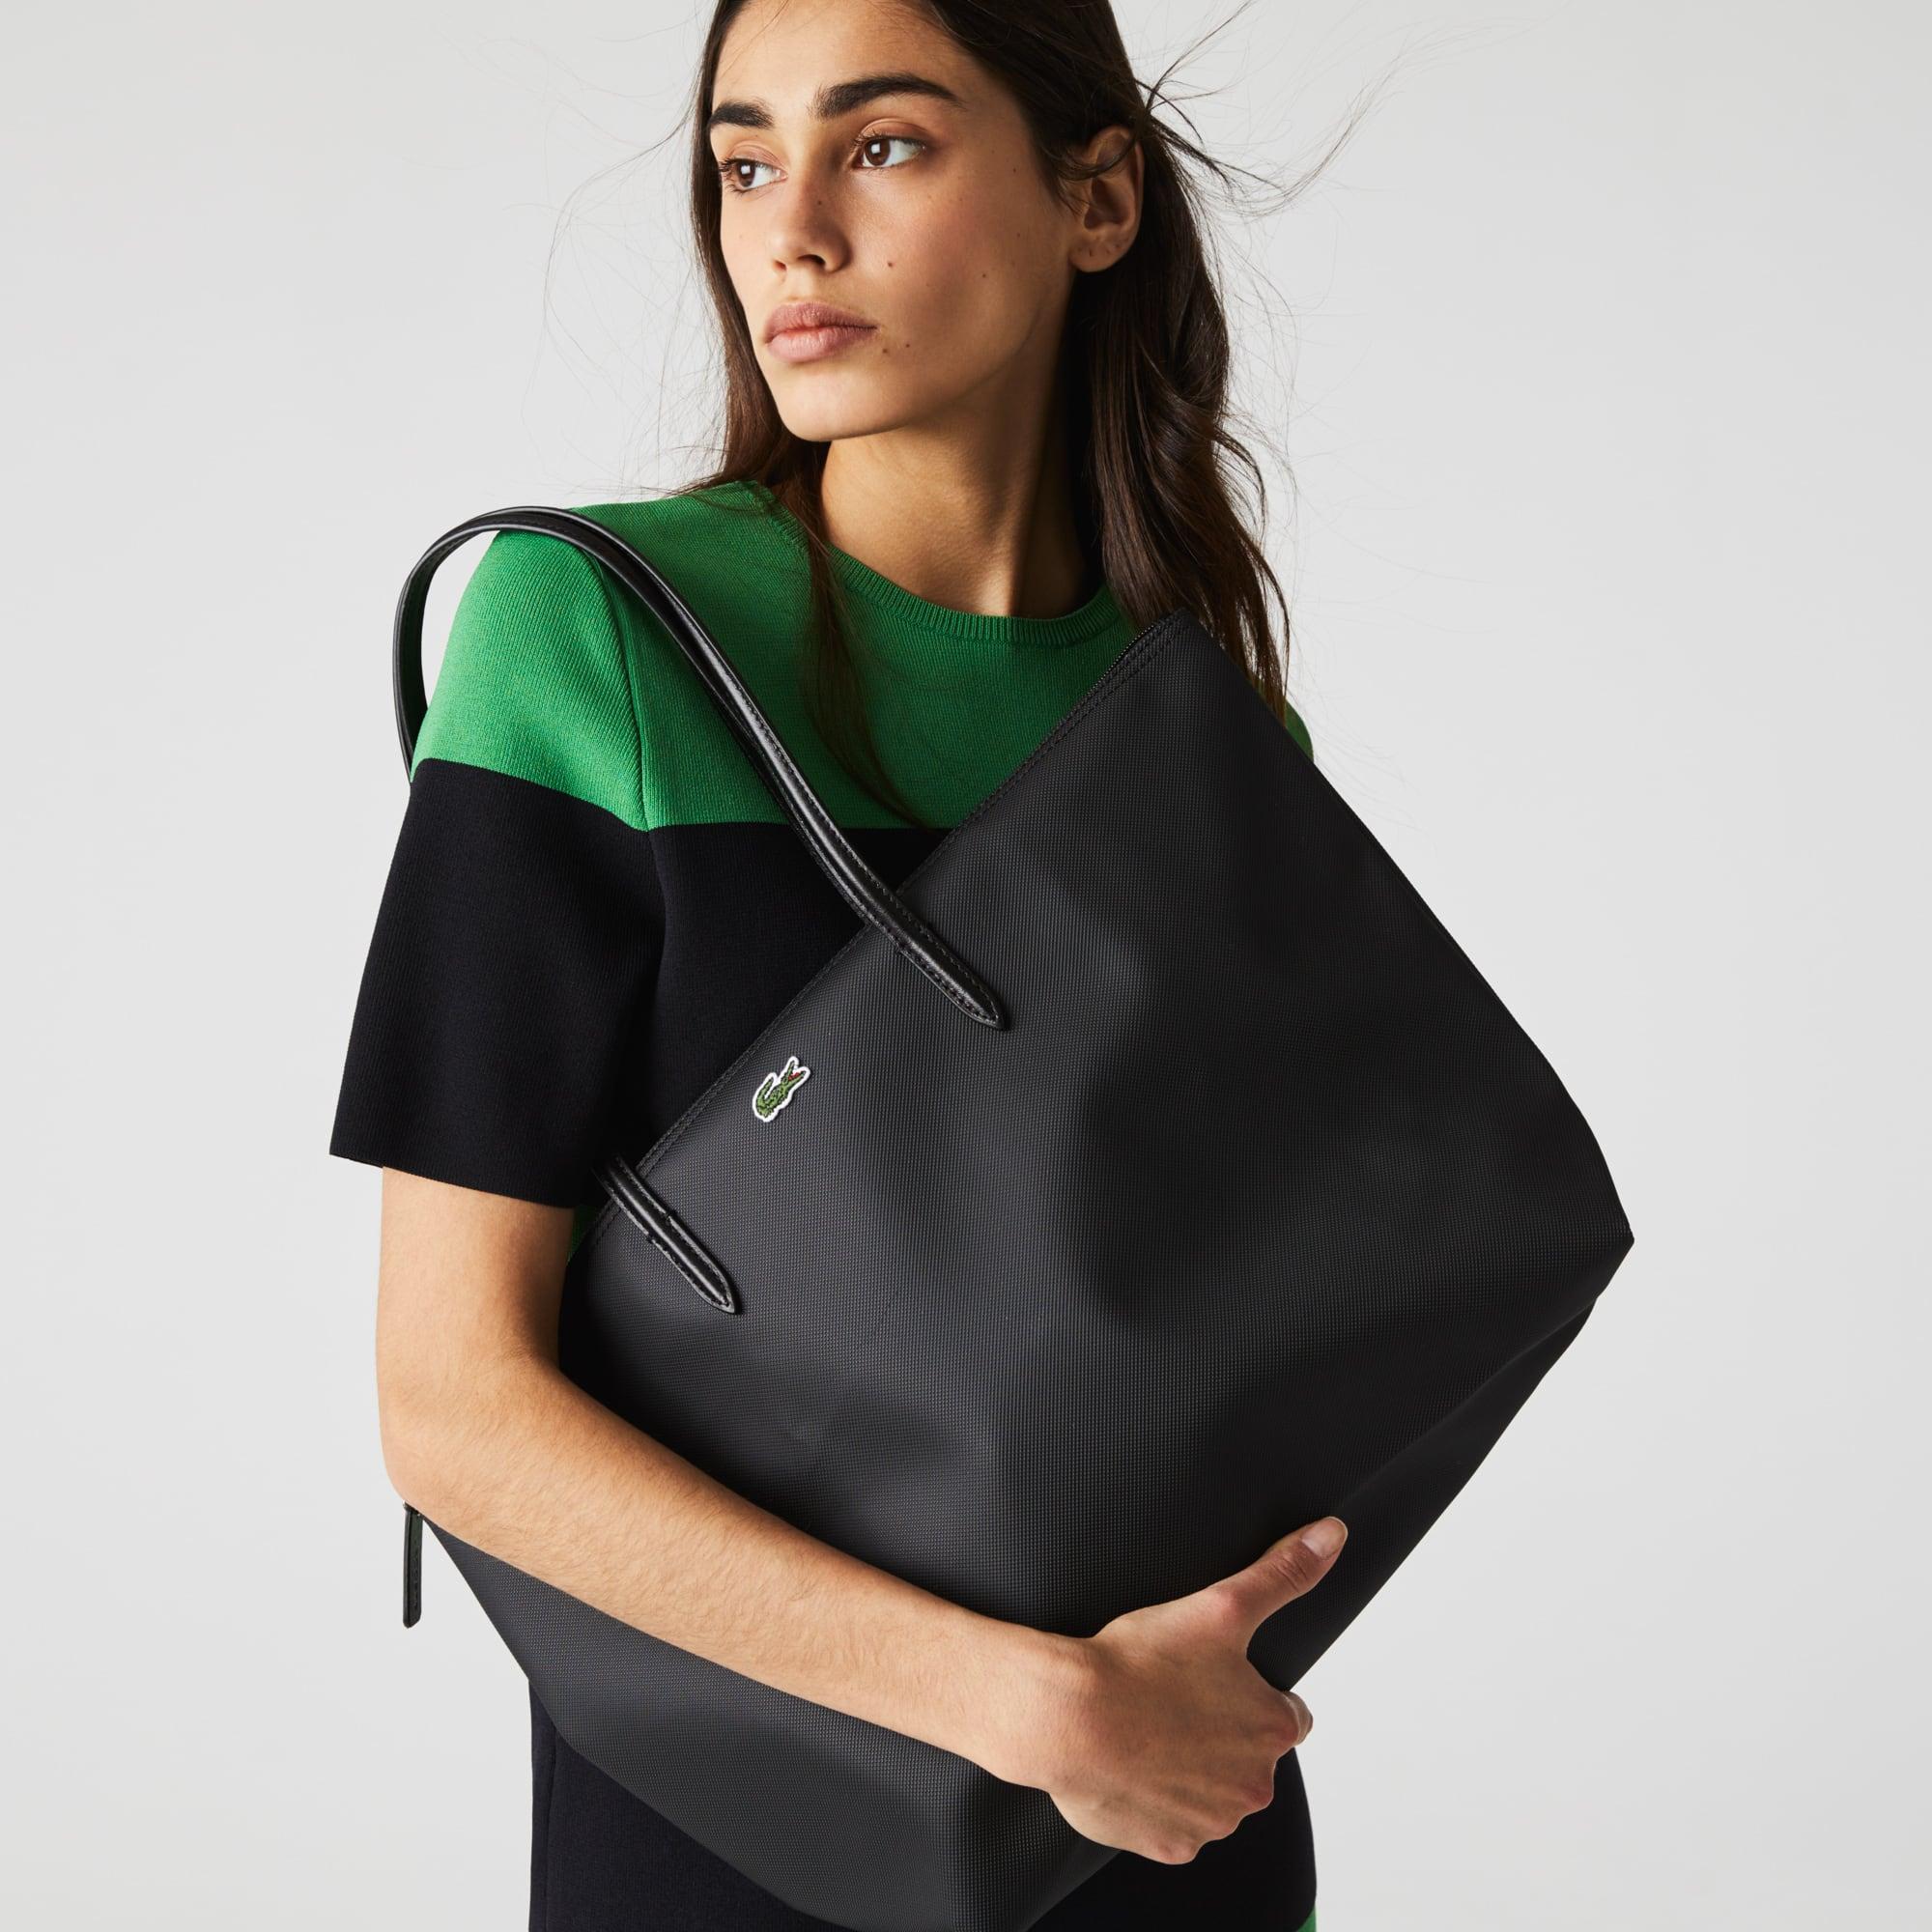 Bagsamp; Handbags CollectionWomen's Leather Goods Lacoste Tl1FKcuJ3